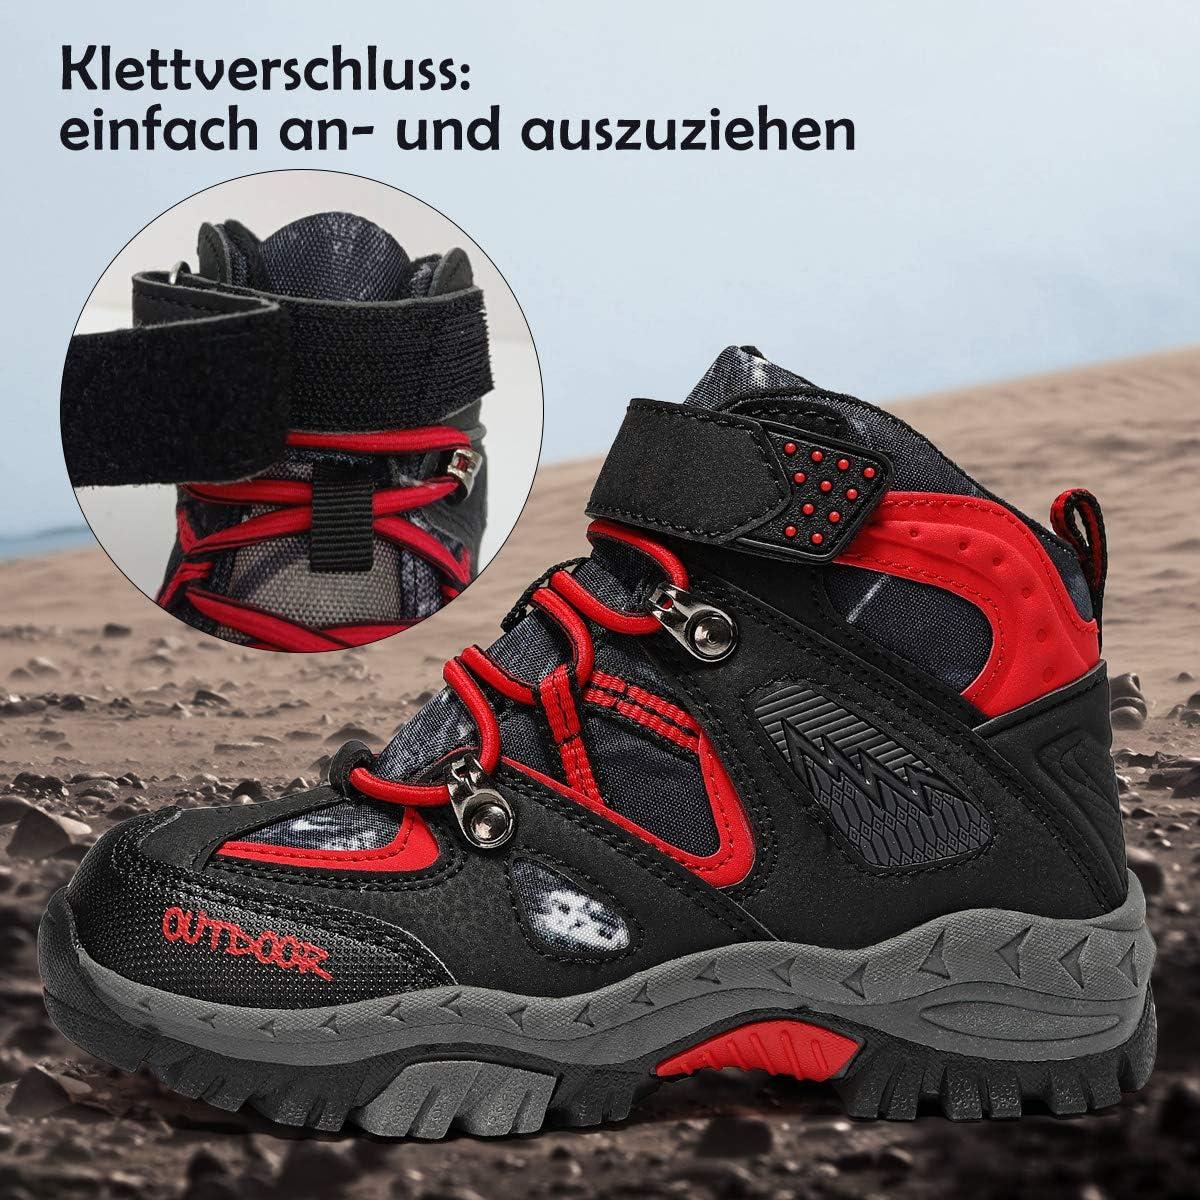 VITUOFLY scarpe da trekking e da trekking da trekking e trekking Scarpe da trekking unisex per bambini da ragazza